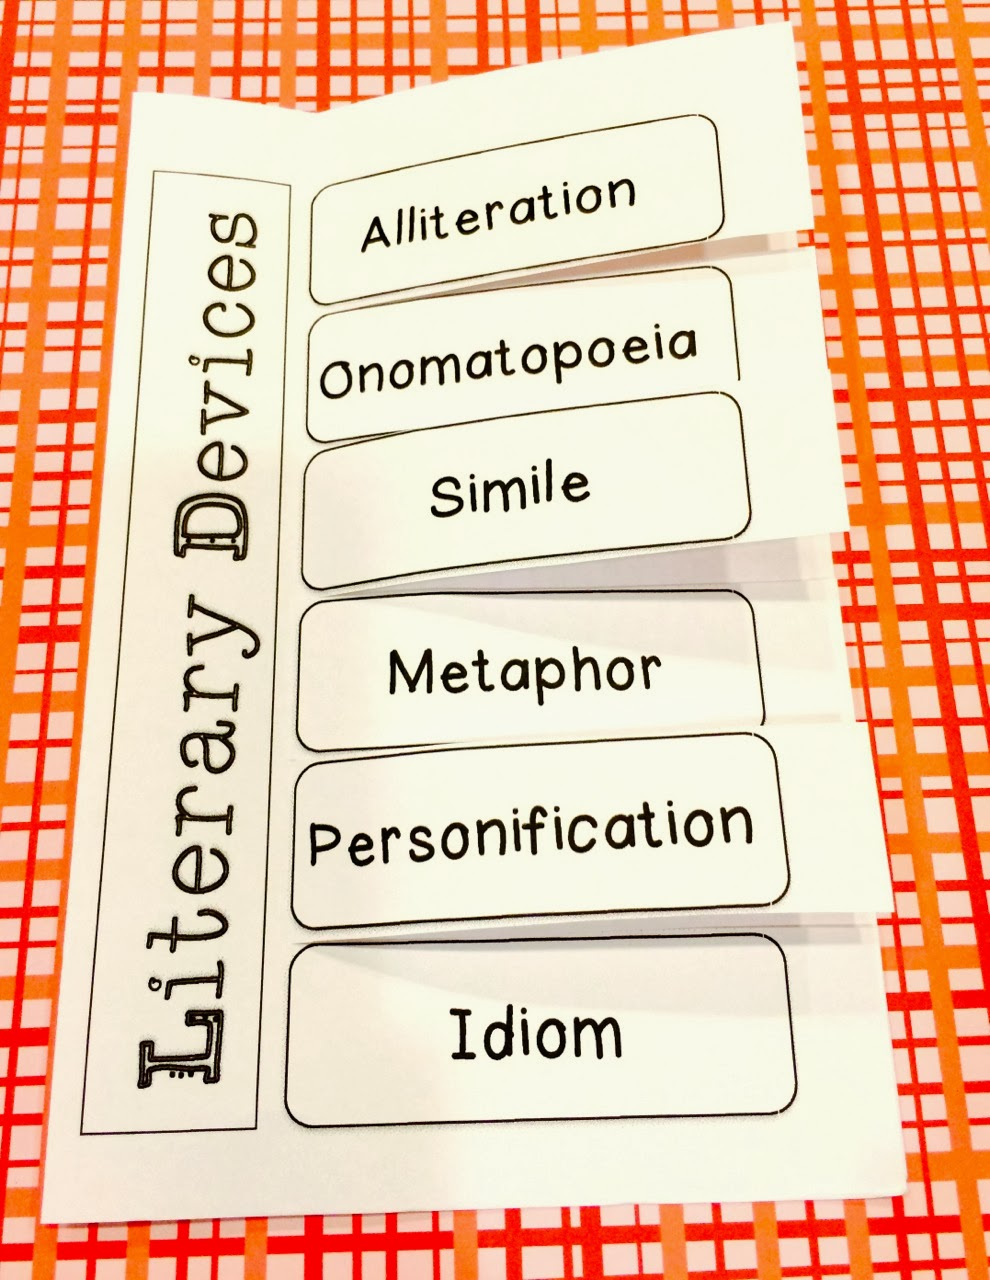 Literacy Loves Company Ono Mato What